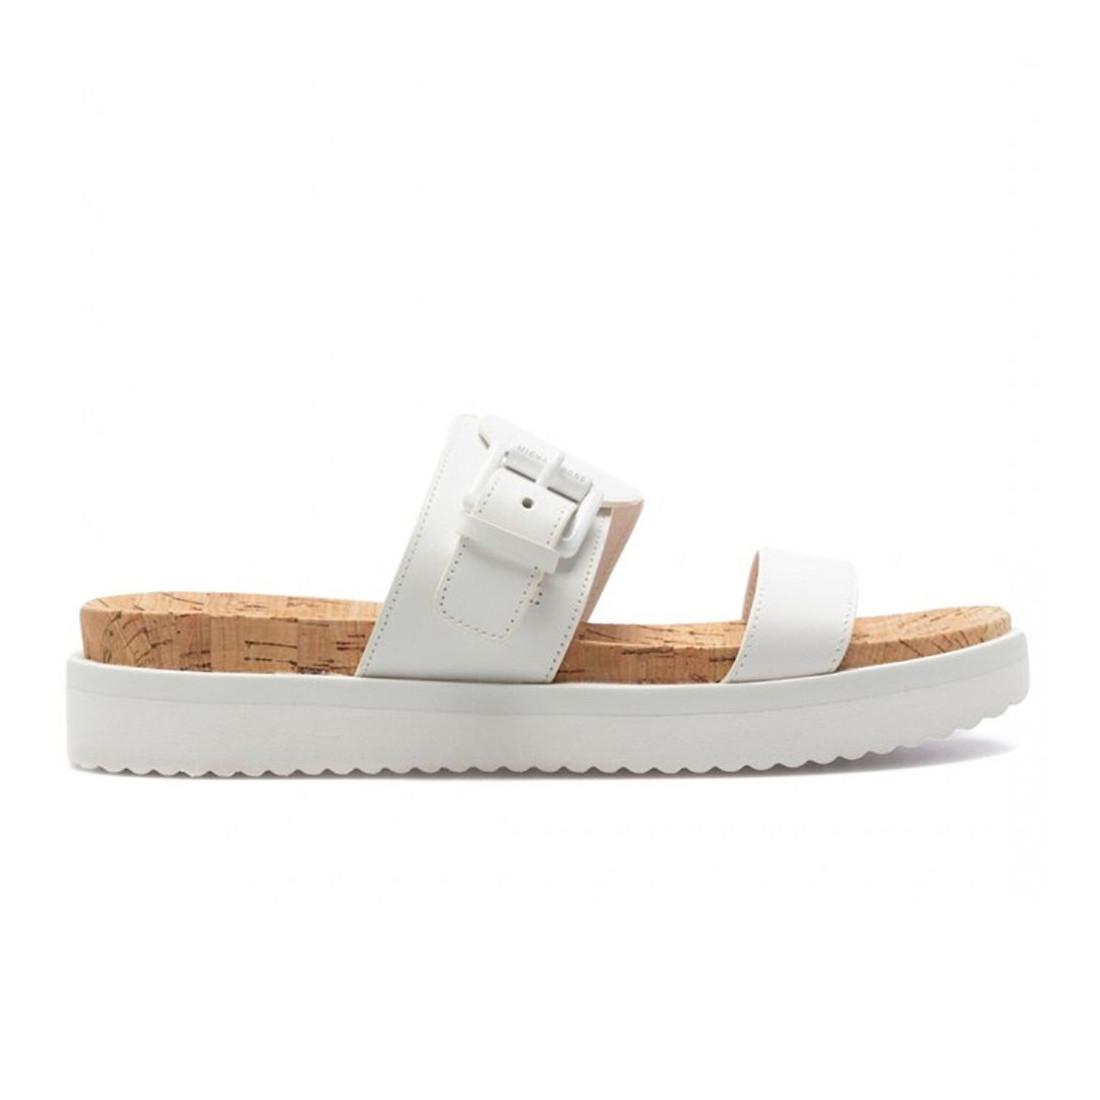 sandals woman michael kors 40s1bofa1l085 8596